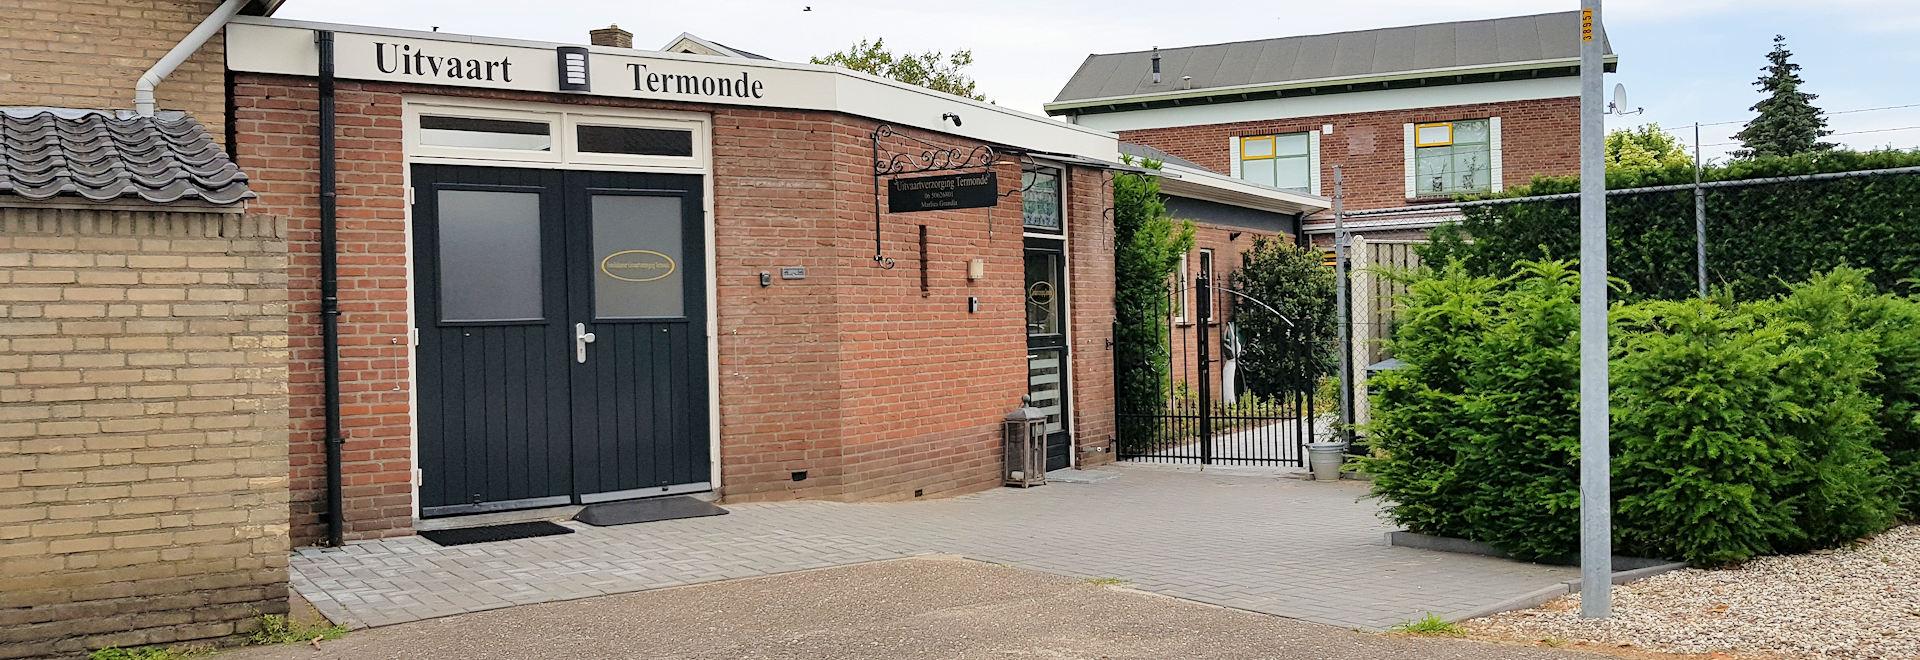 Uitvaart Centrum Termonde Kerkdriel